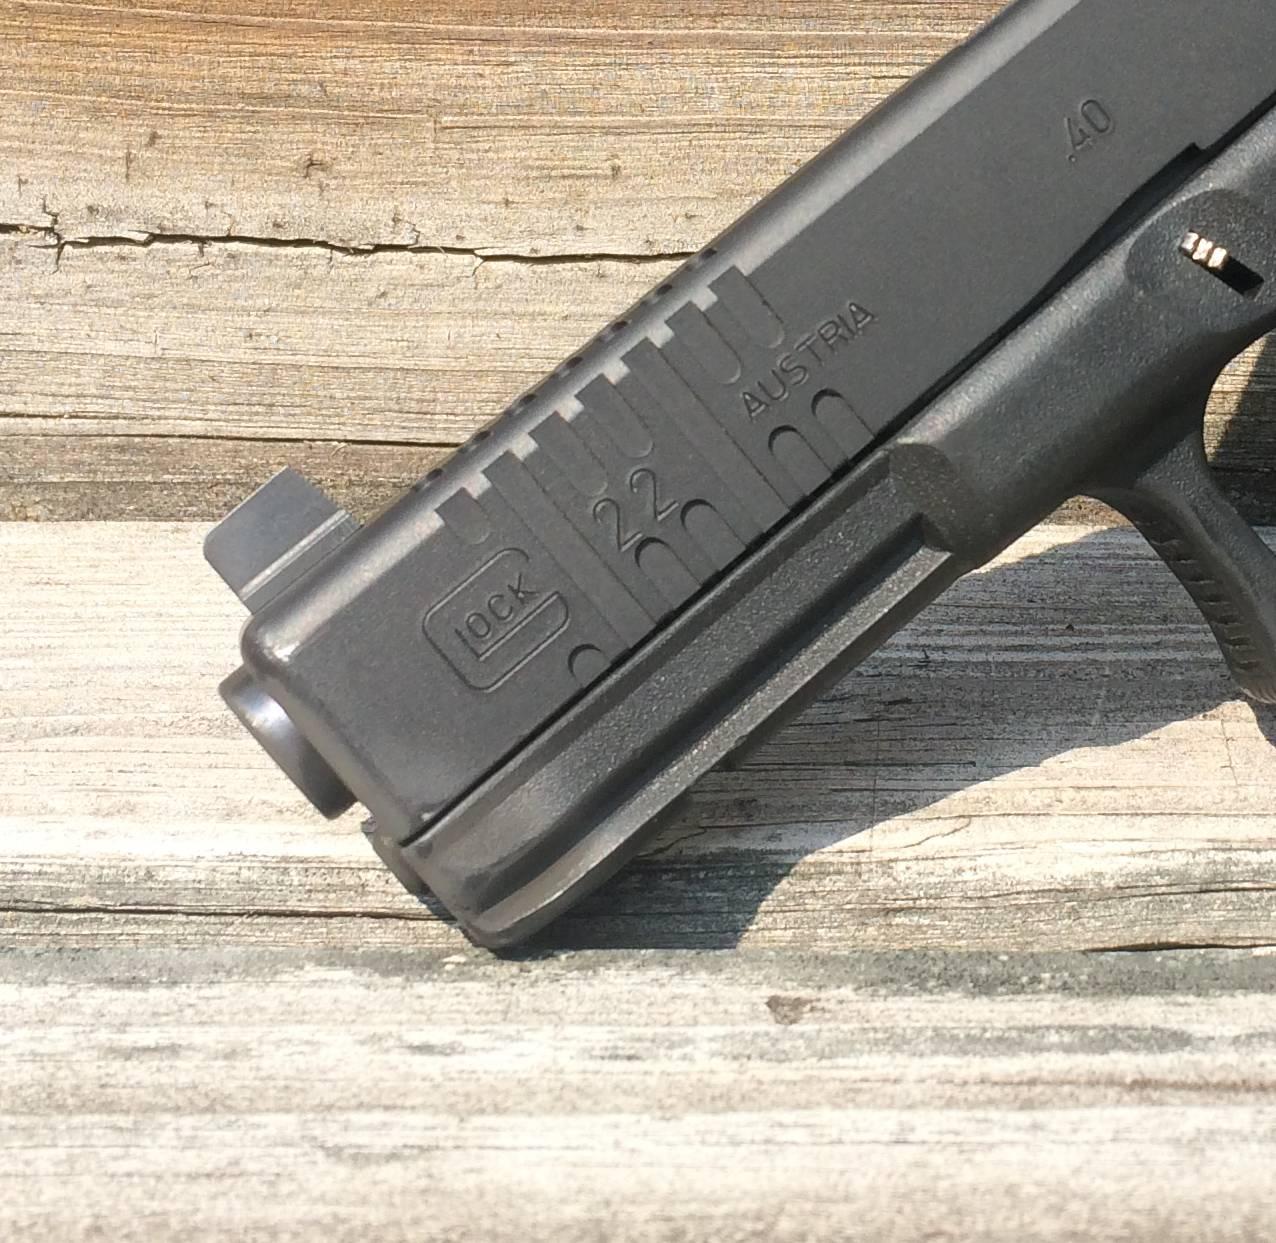 Esstisch Front Slide ~ Machining front cocking serrations on a Glock slide – rifleshootercom